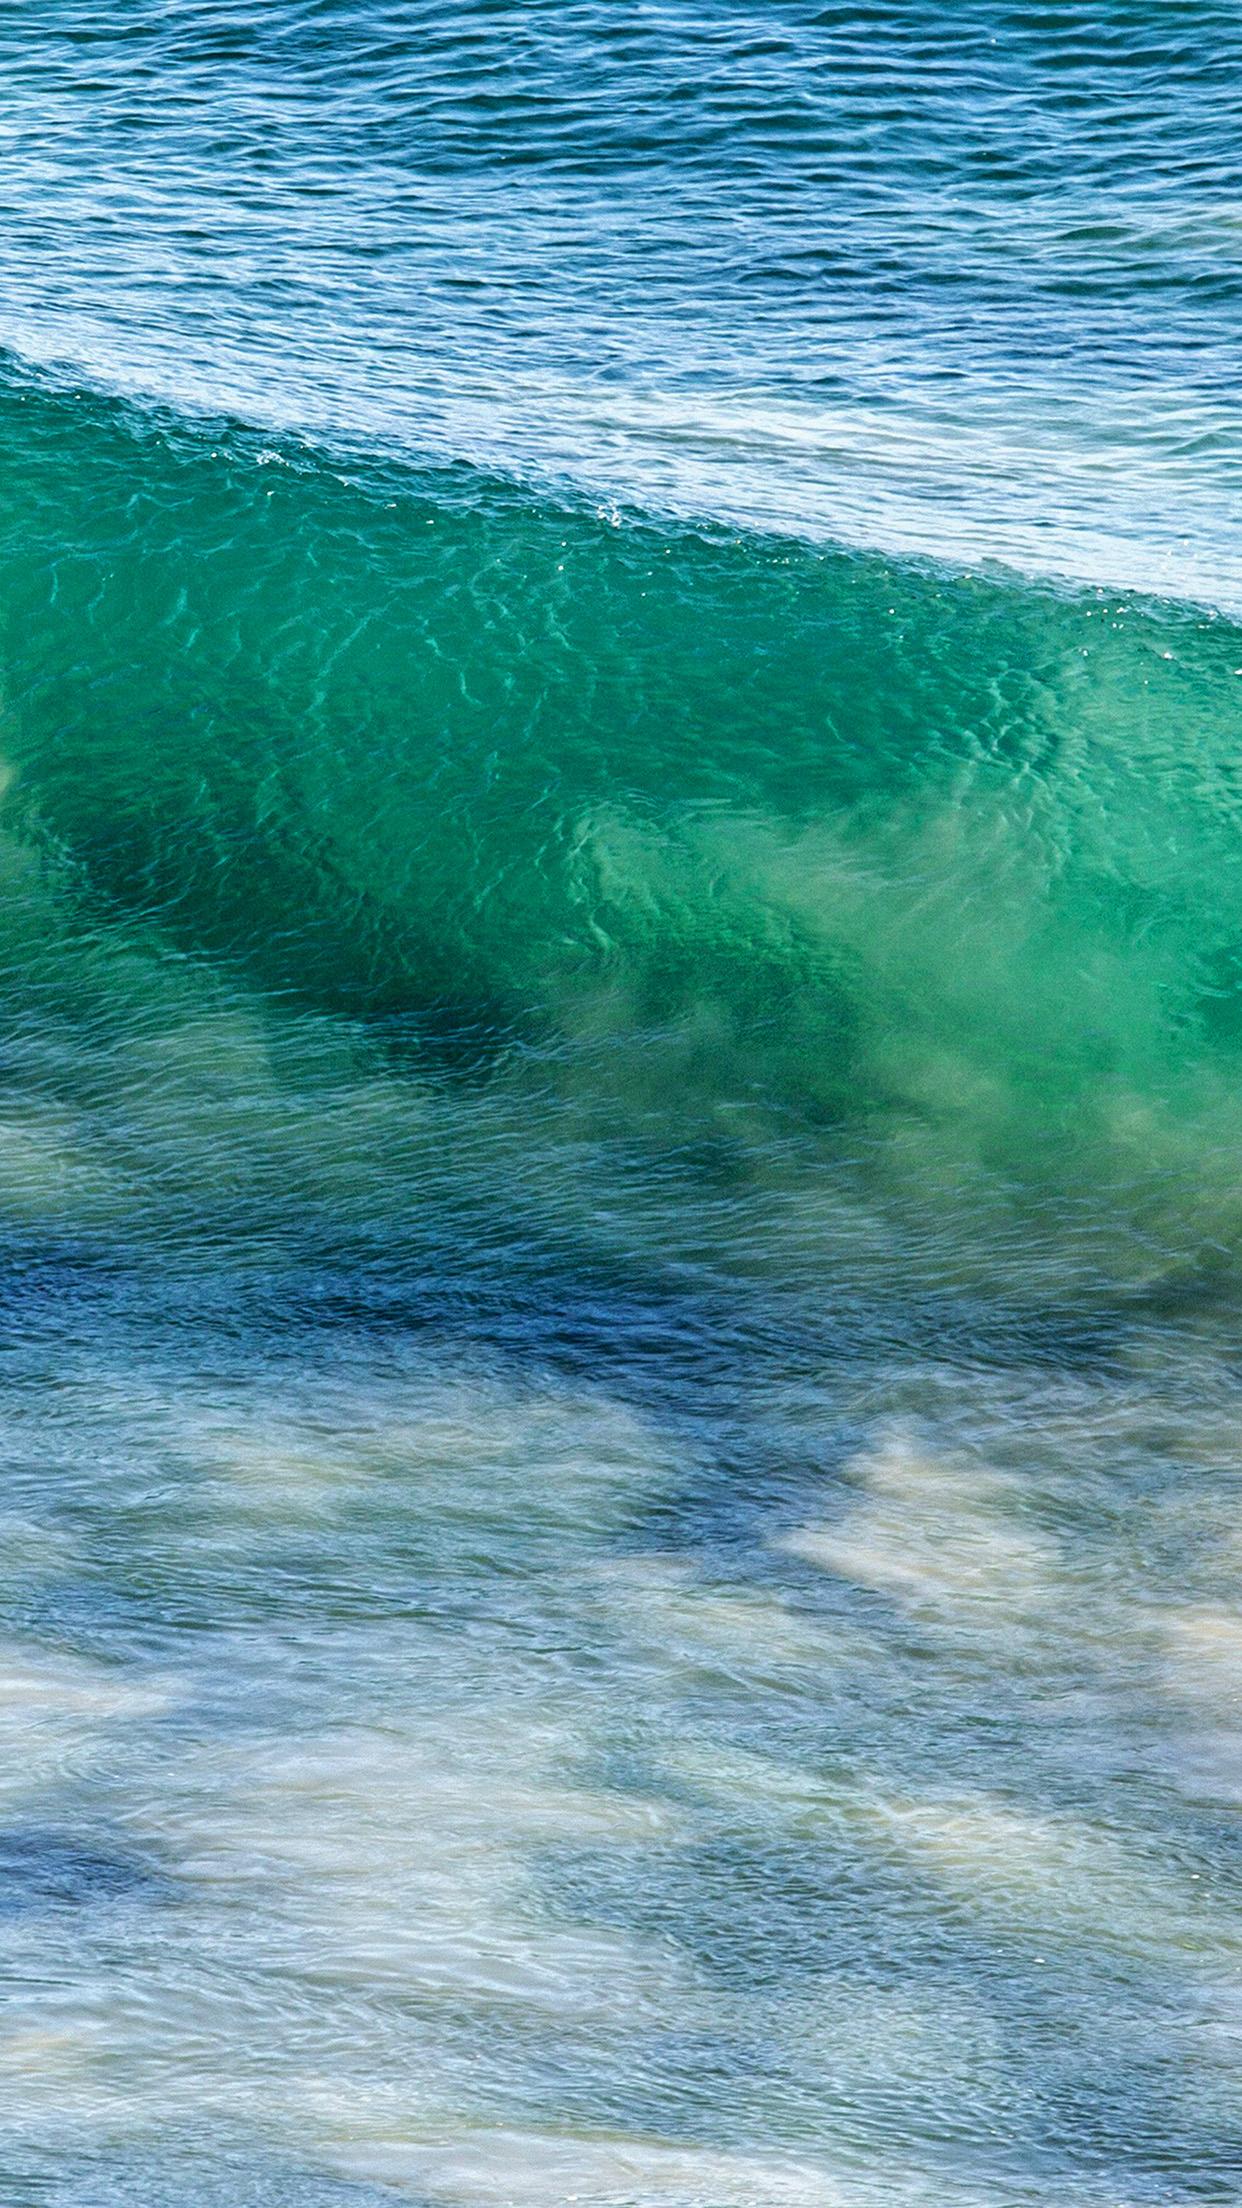 Sea Wave Nature Ocean Summer Fun Android Wallpaper - Iphone 8 Plus Summer Background - HD Wallpaper